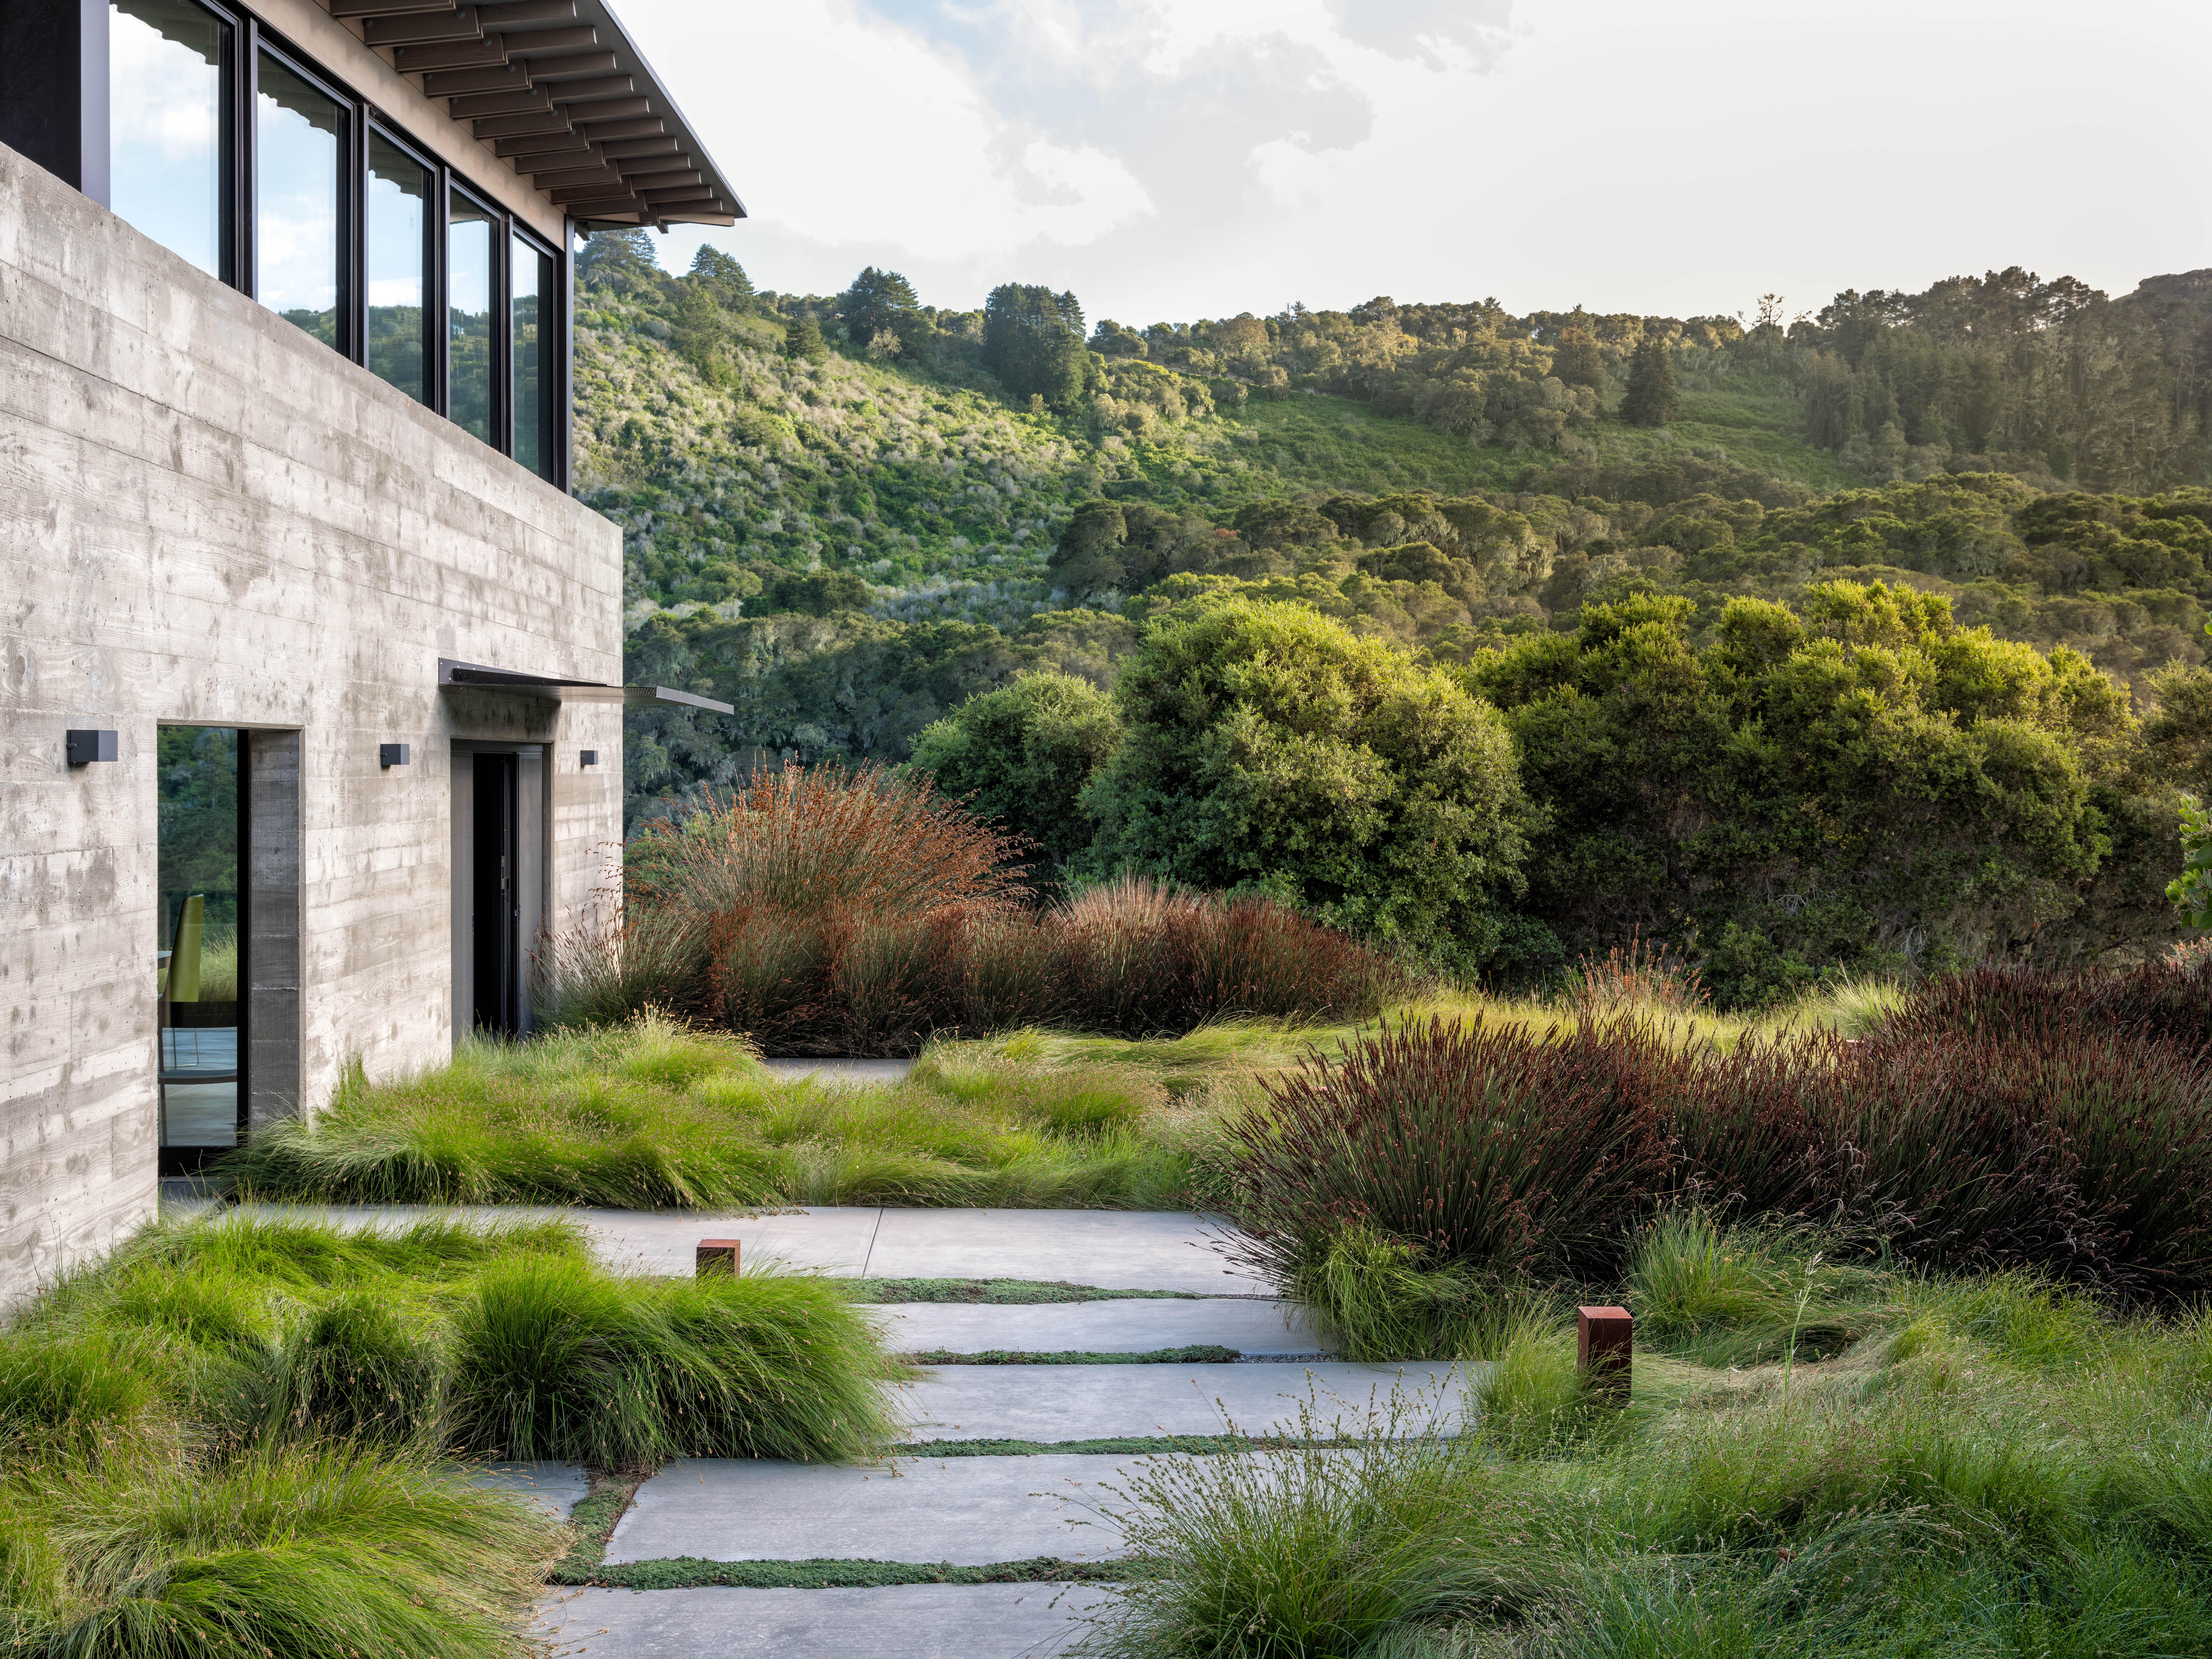 Drifts of bright green grasses (Carex divulsa) edge the path. Lighting designer Kim Cladas chose unobtrusive bollard lighting fixtures from Germany-based SLV&#8